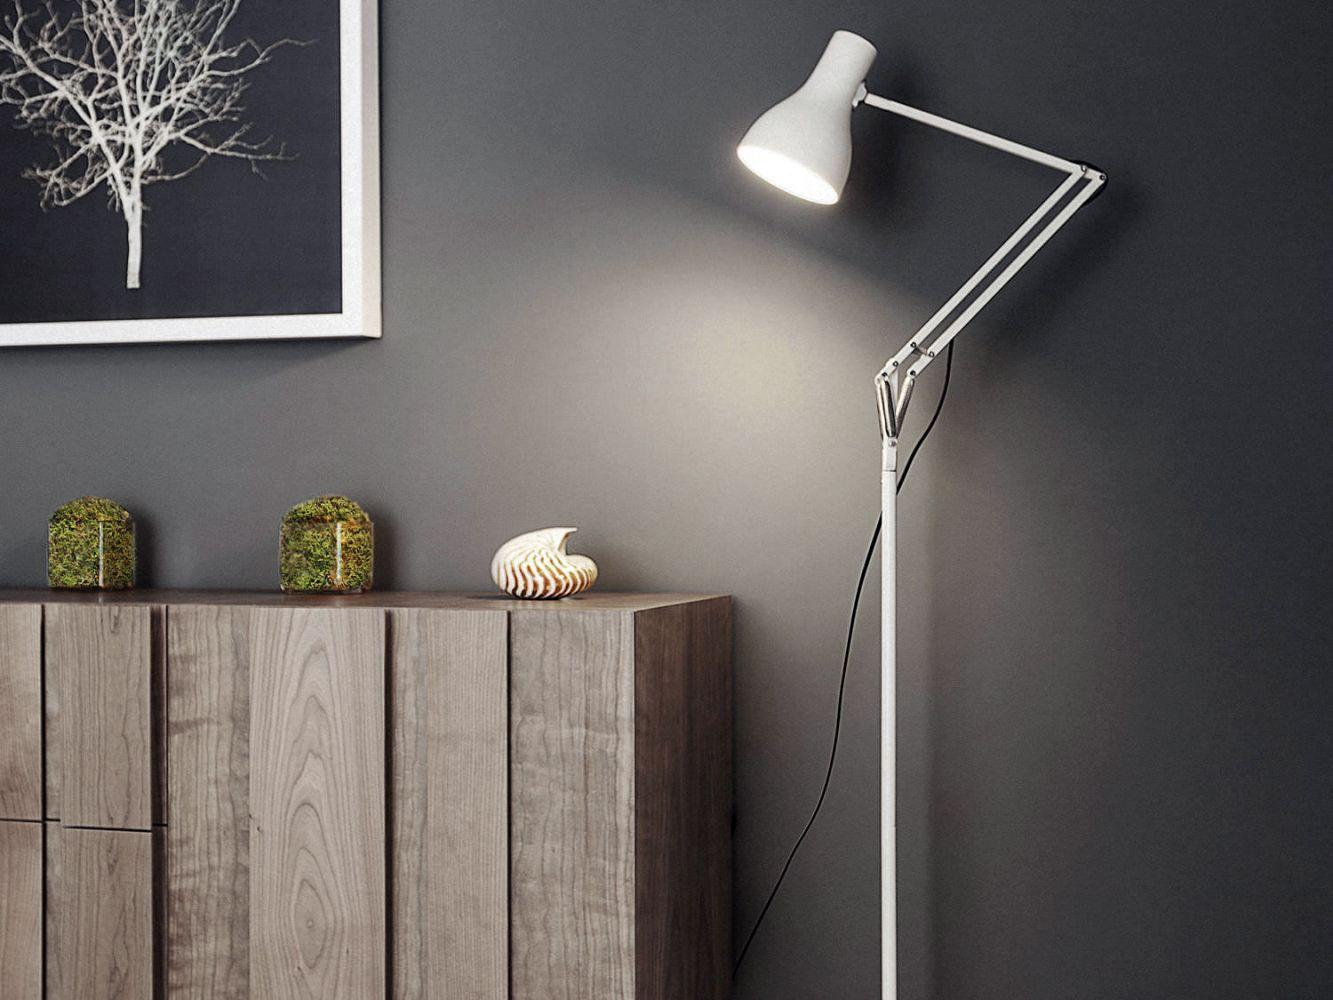 anglepoise fabricant anglais de luminaires meuble et. Black Bedroom Furniture Sets. Home Design Ideas